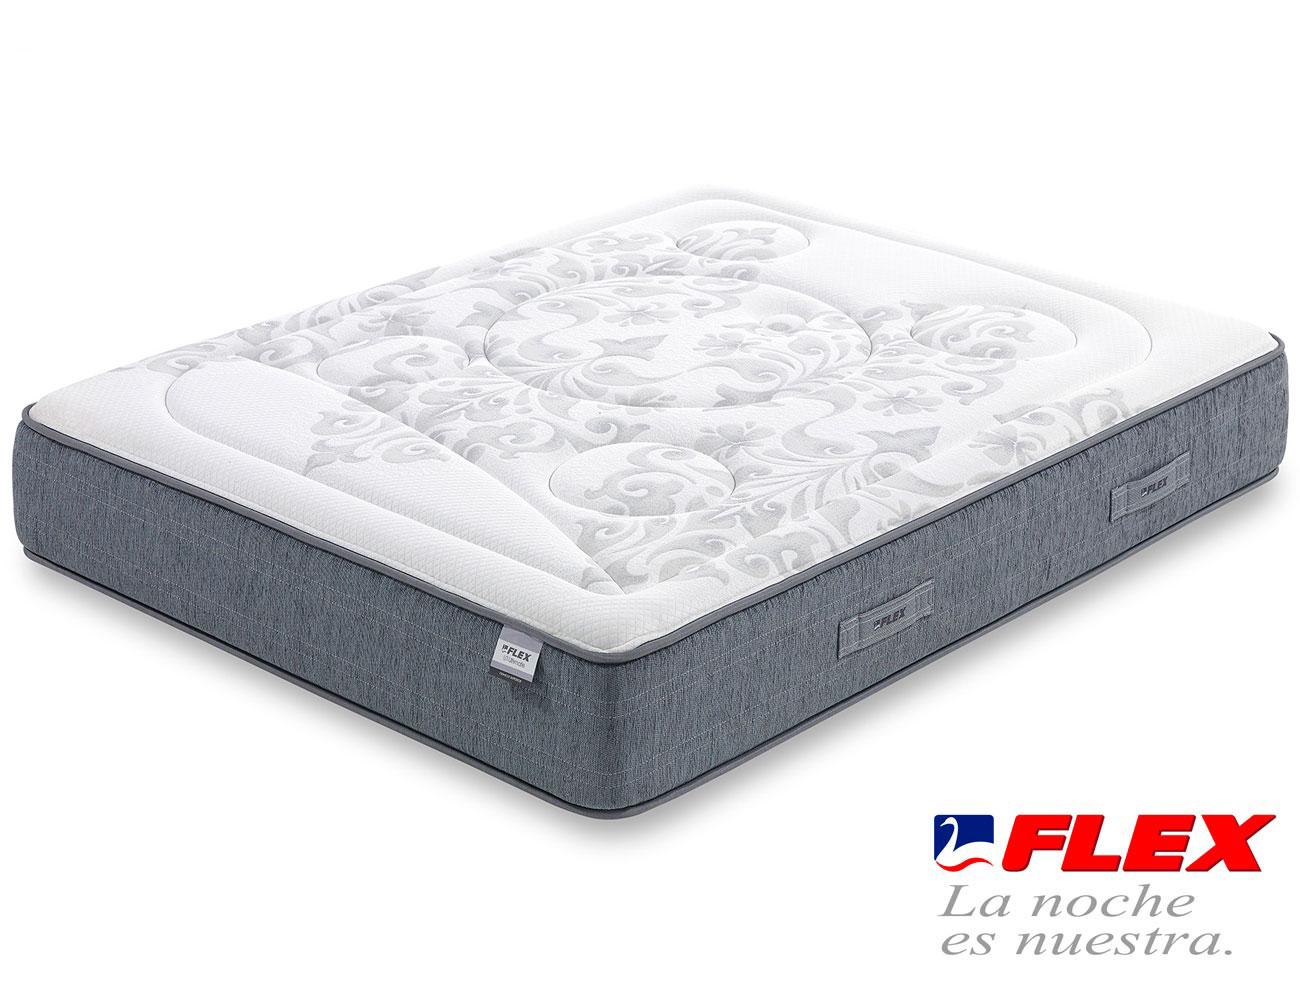 Colchon flex airvex viscoelastica gel garbi superior14